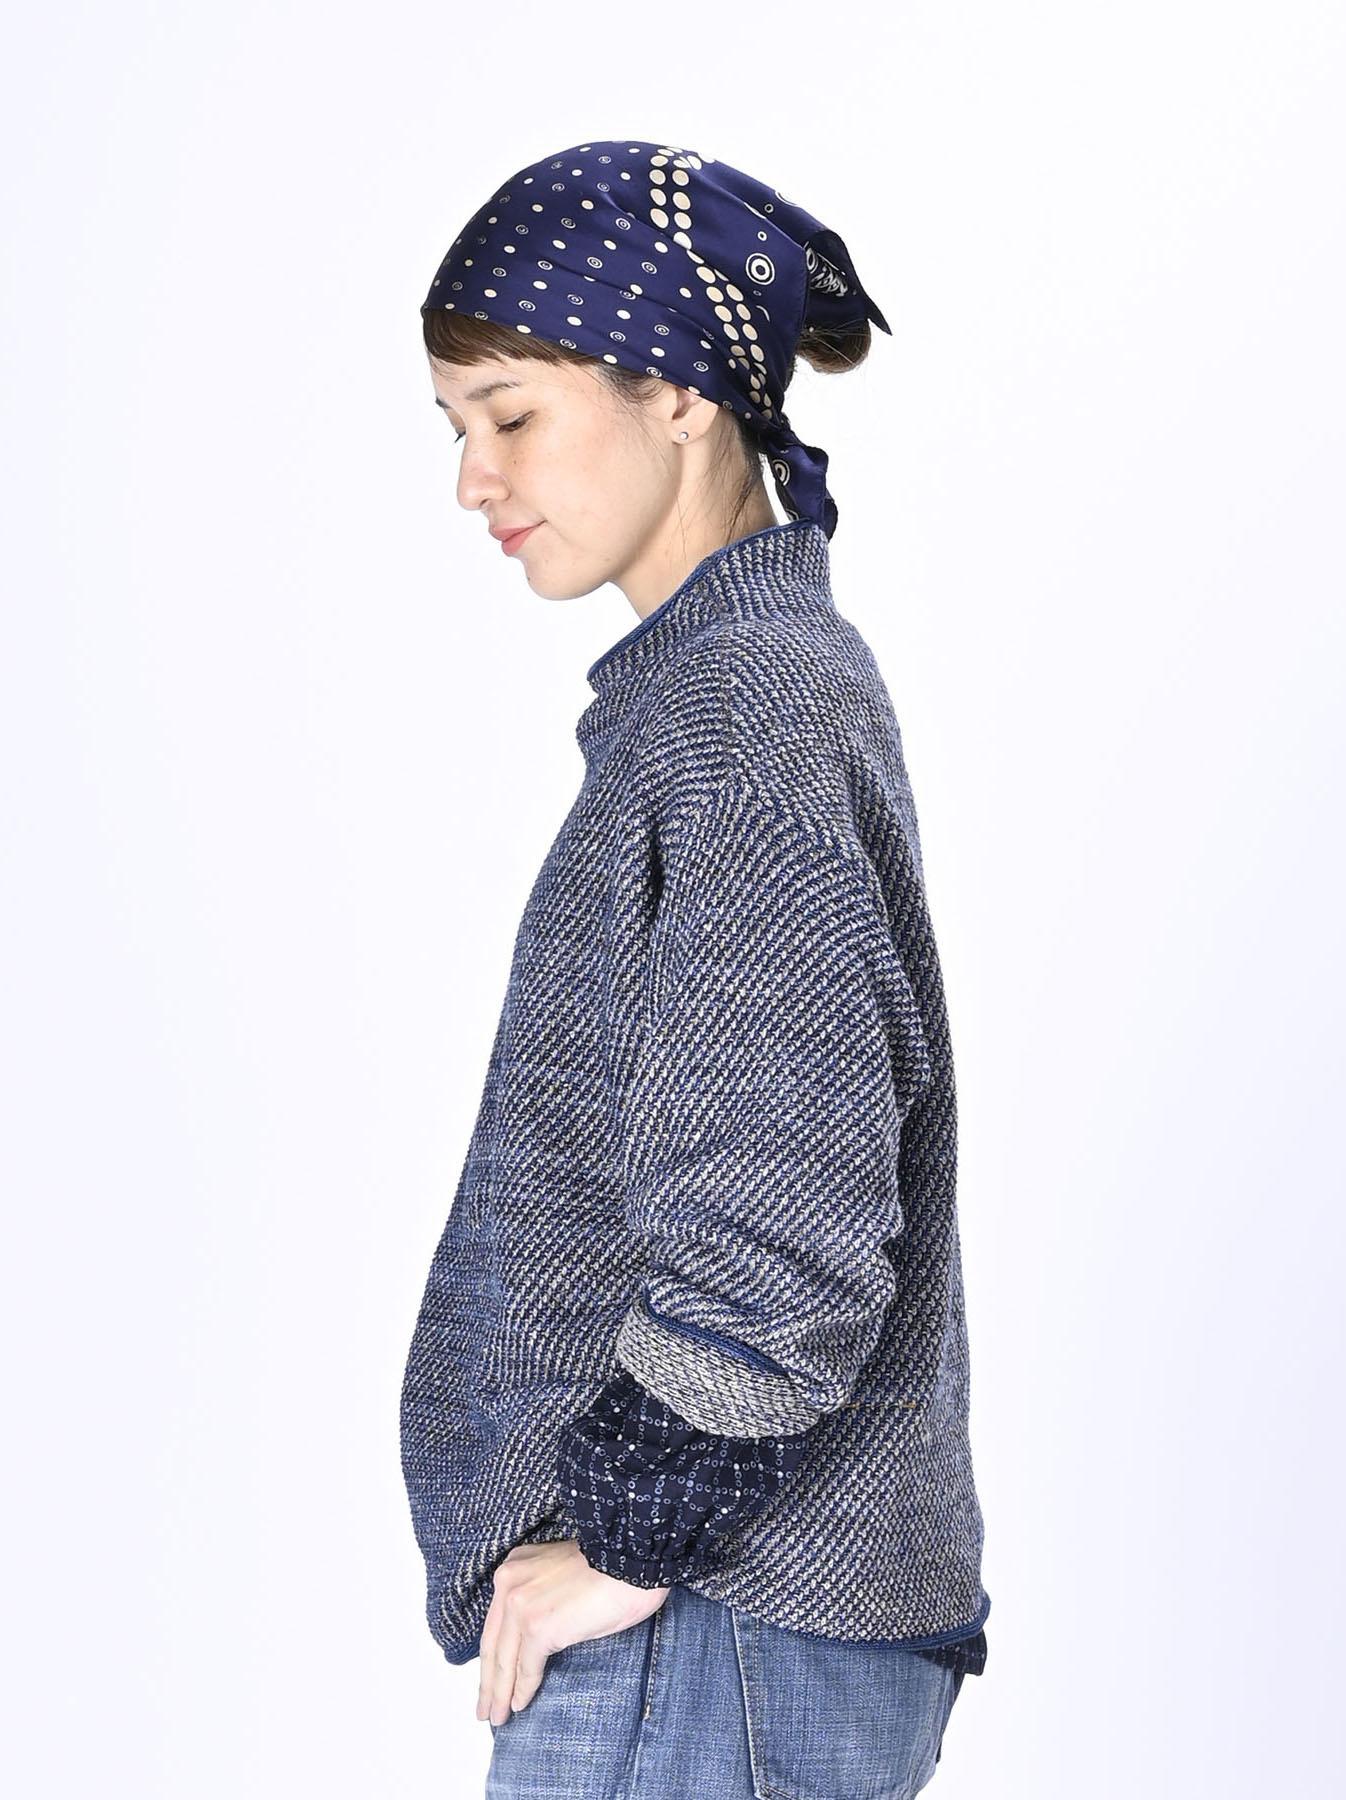 Indigo Knit Jacquard 908 Umahiko Sweater-4